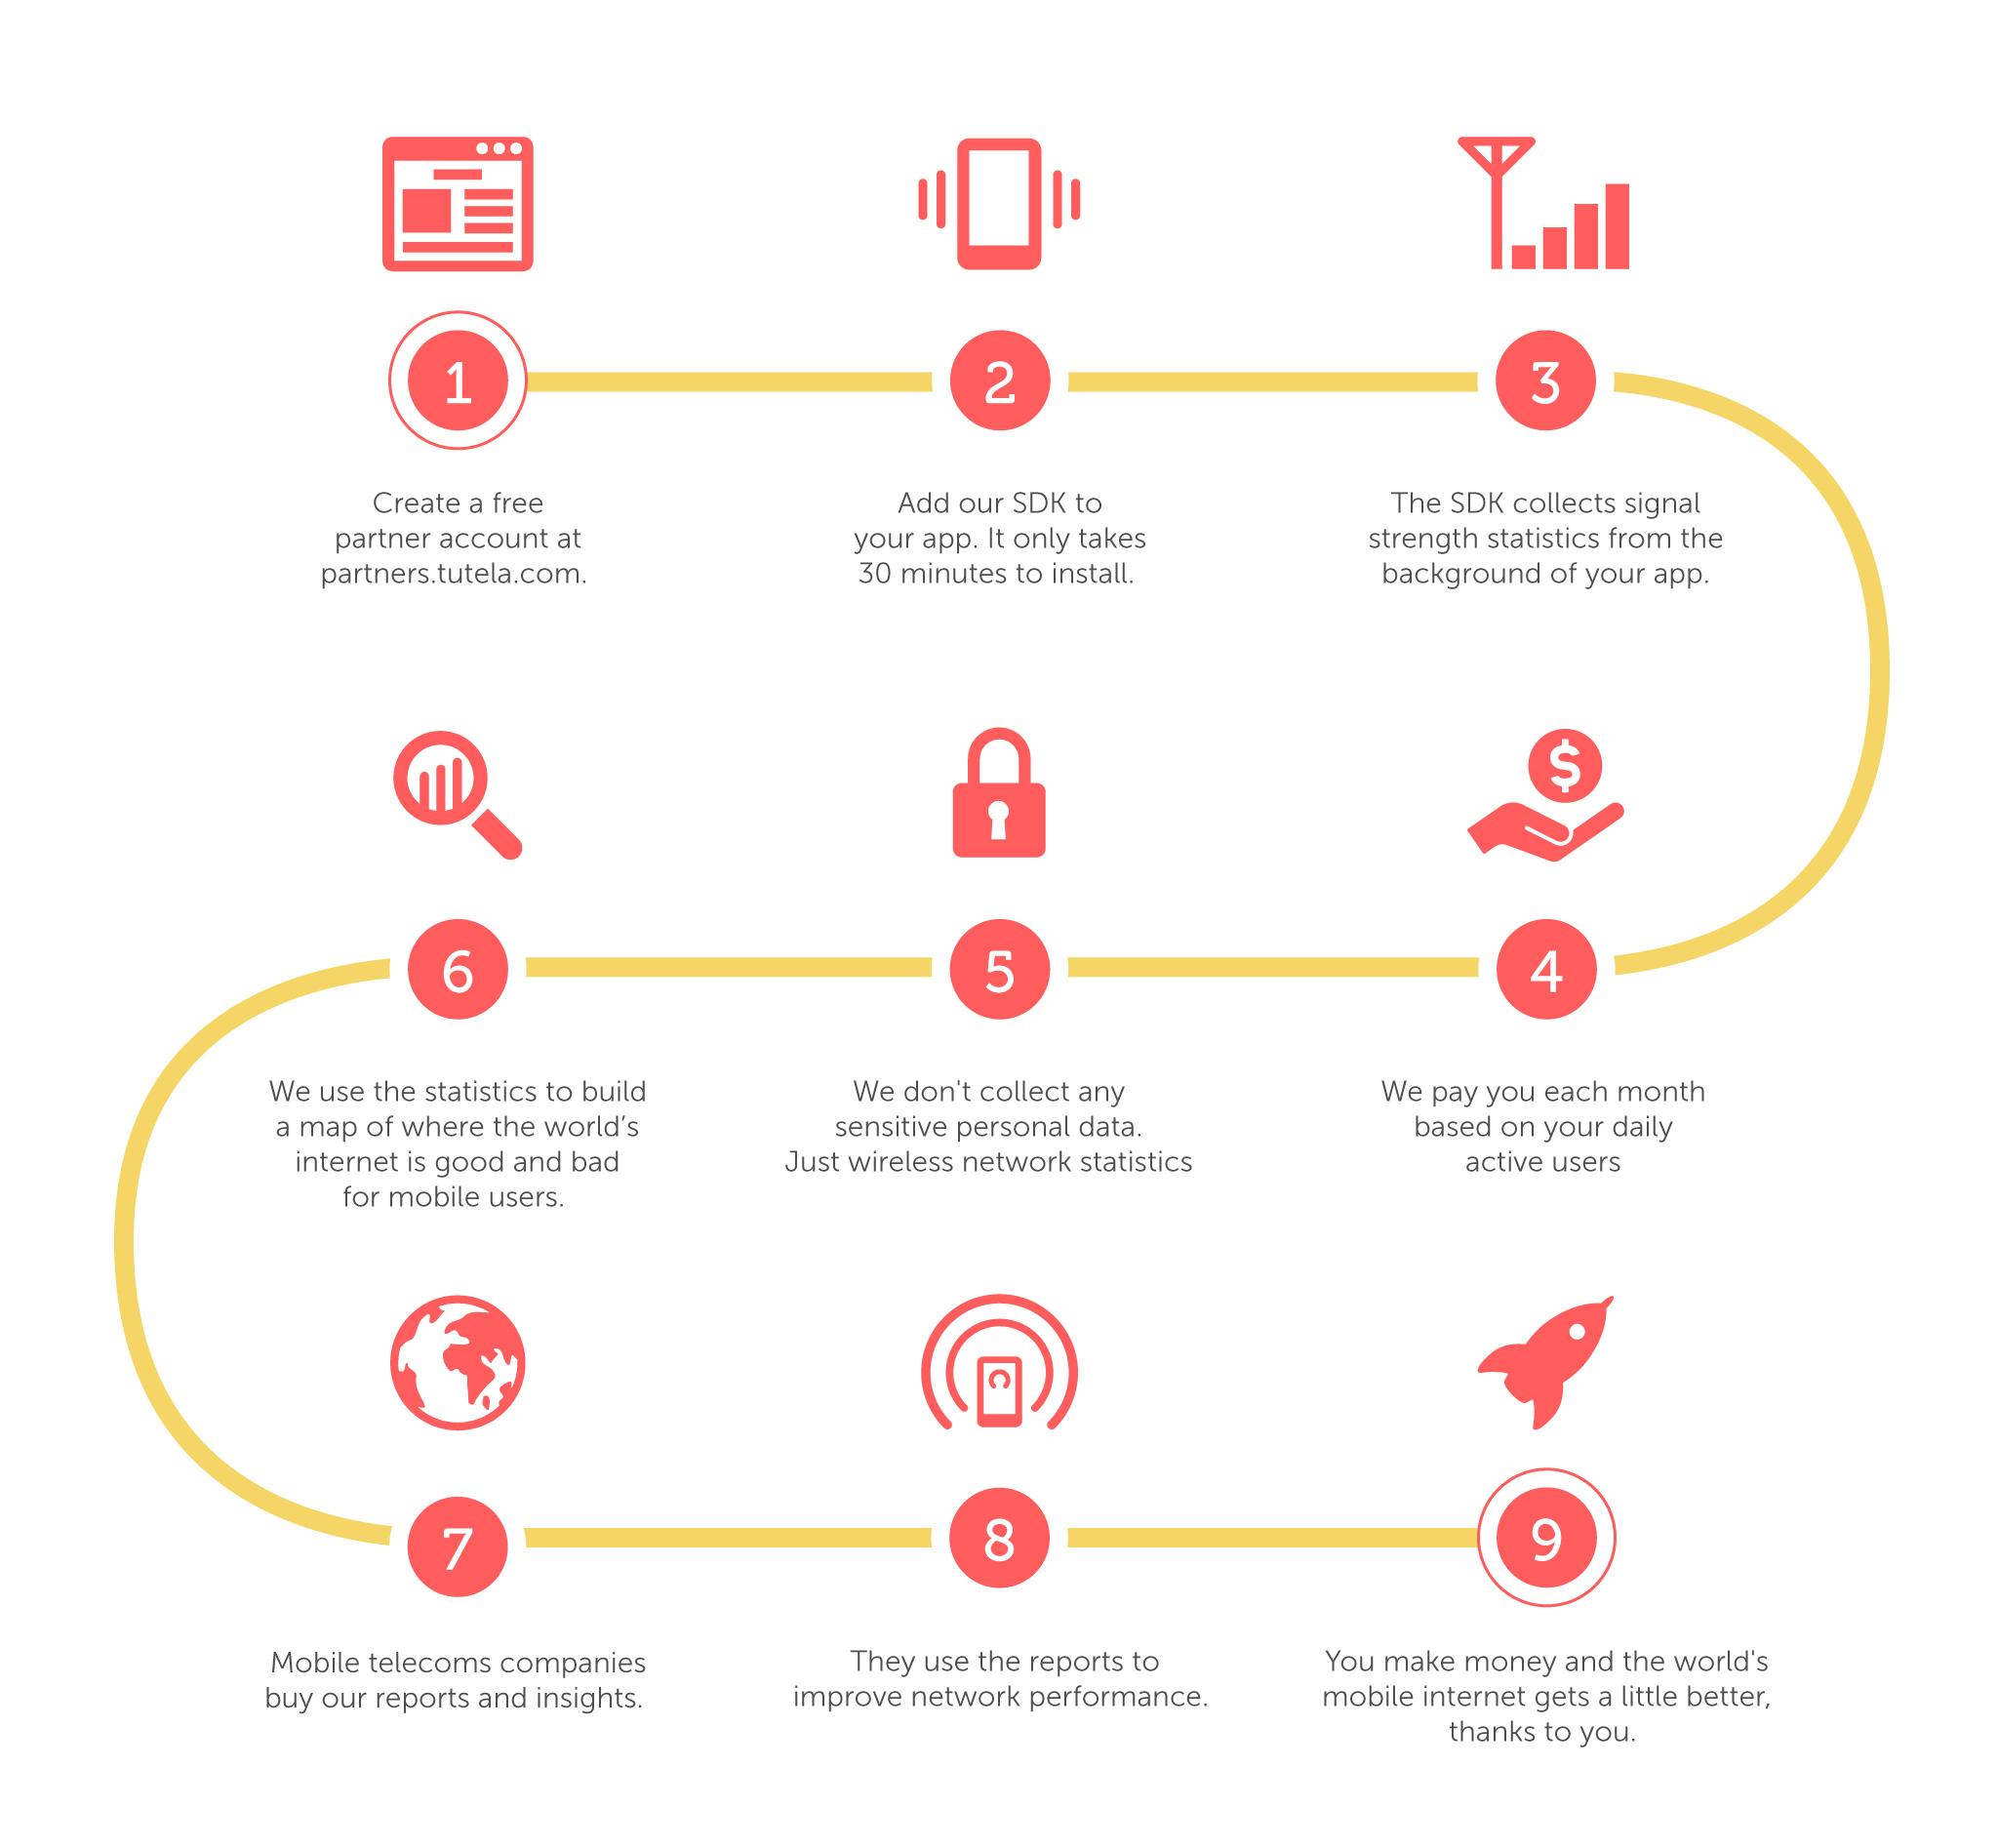 tutela-infographic